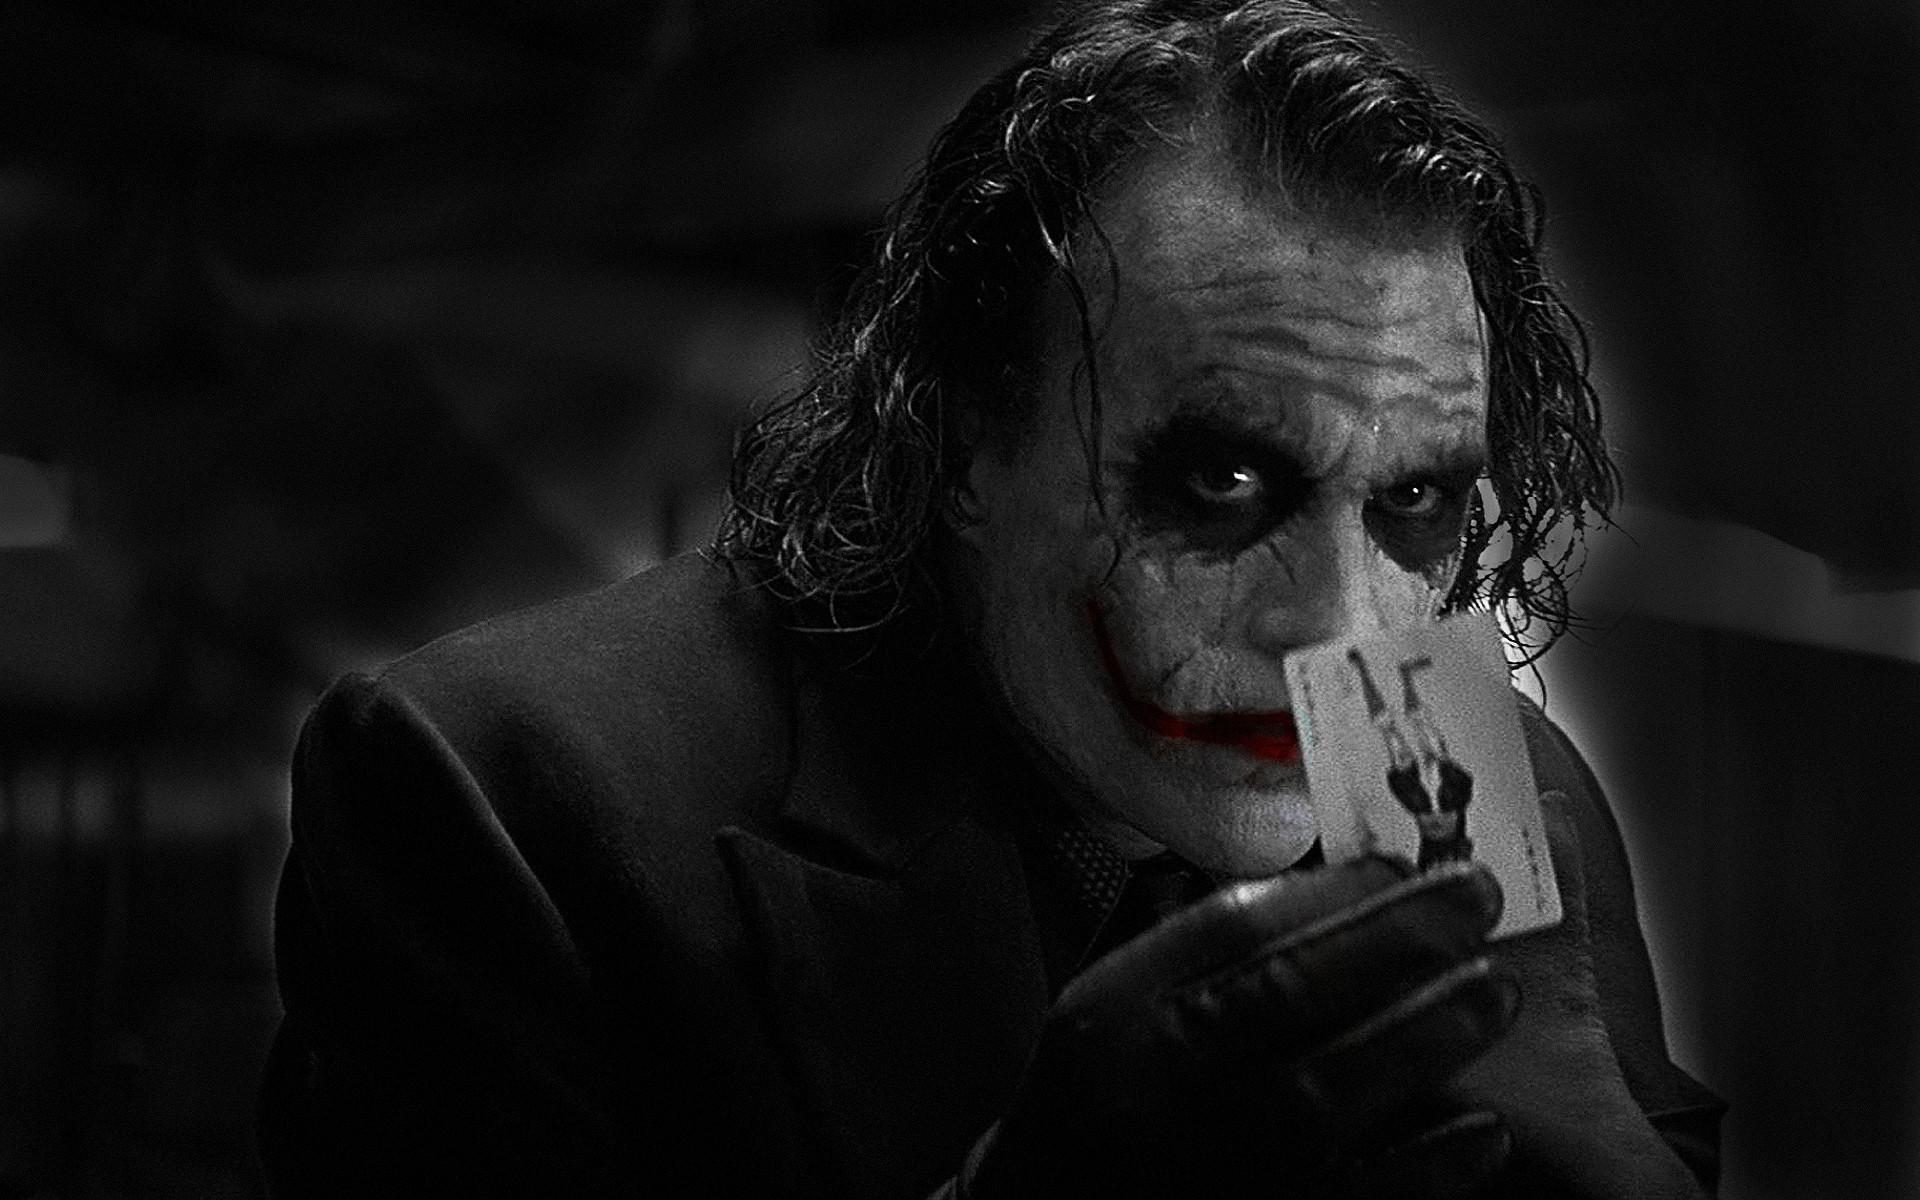 Wallpaper Portrait The Dark Knight Batman Joker Movies